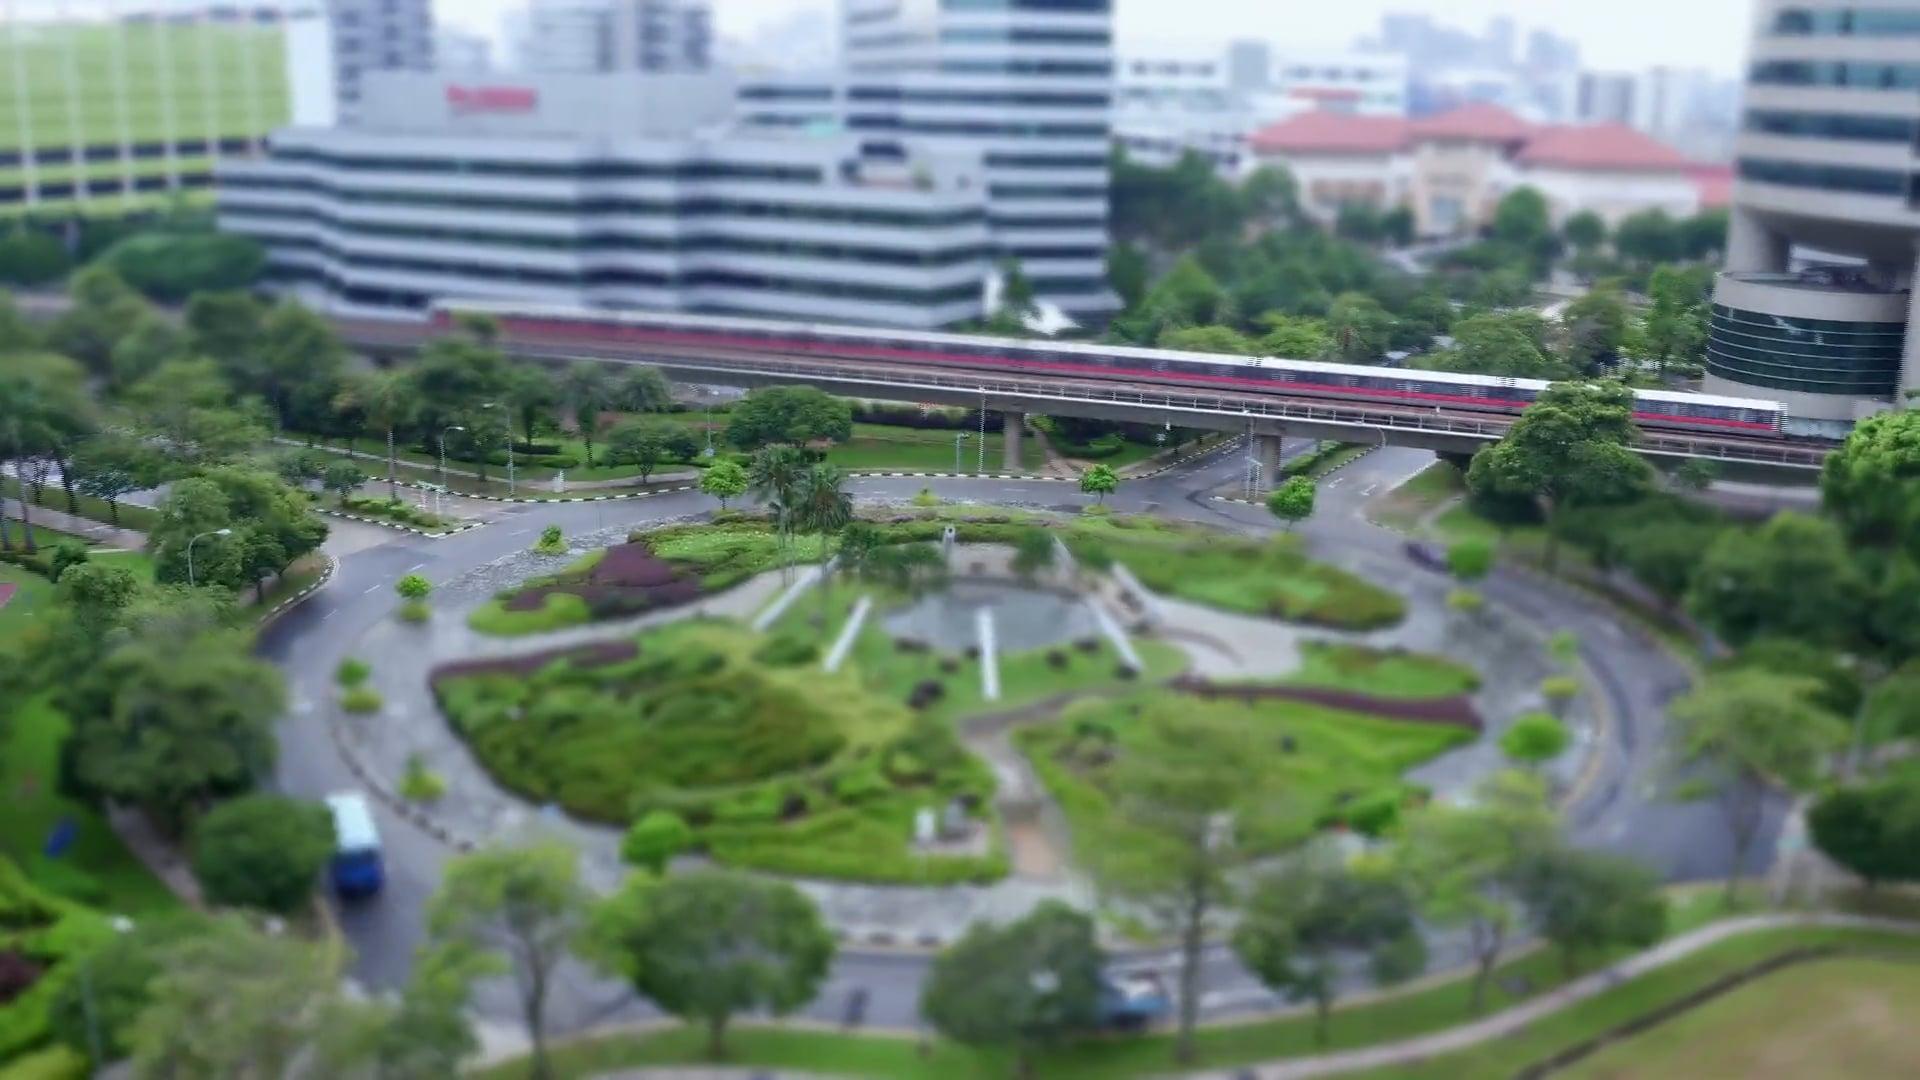 Surbana Jurong Corporate Video - Singapore